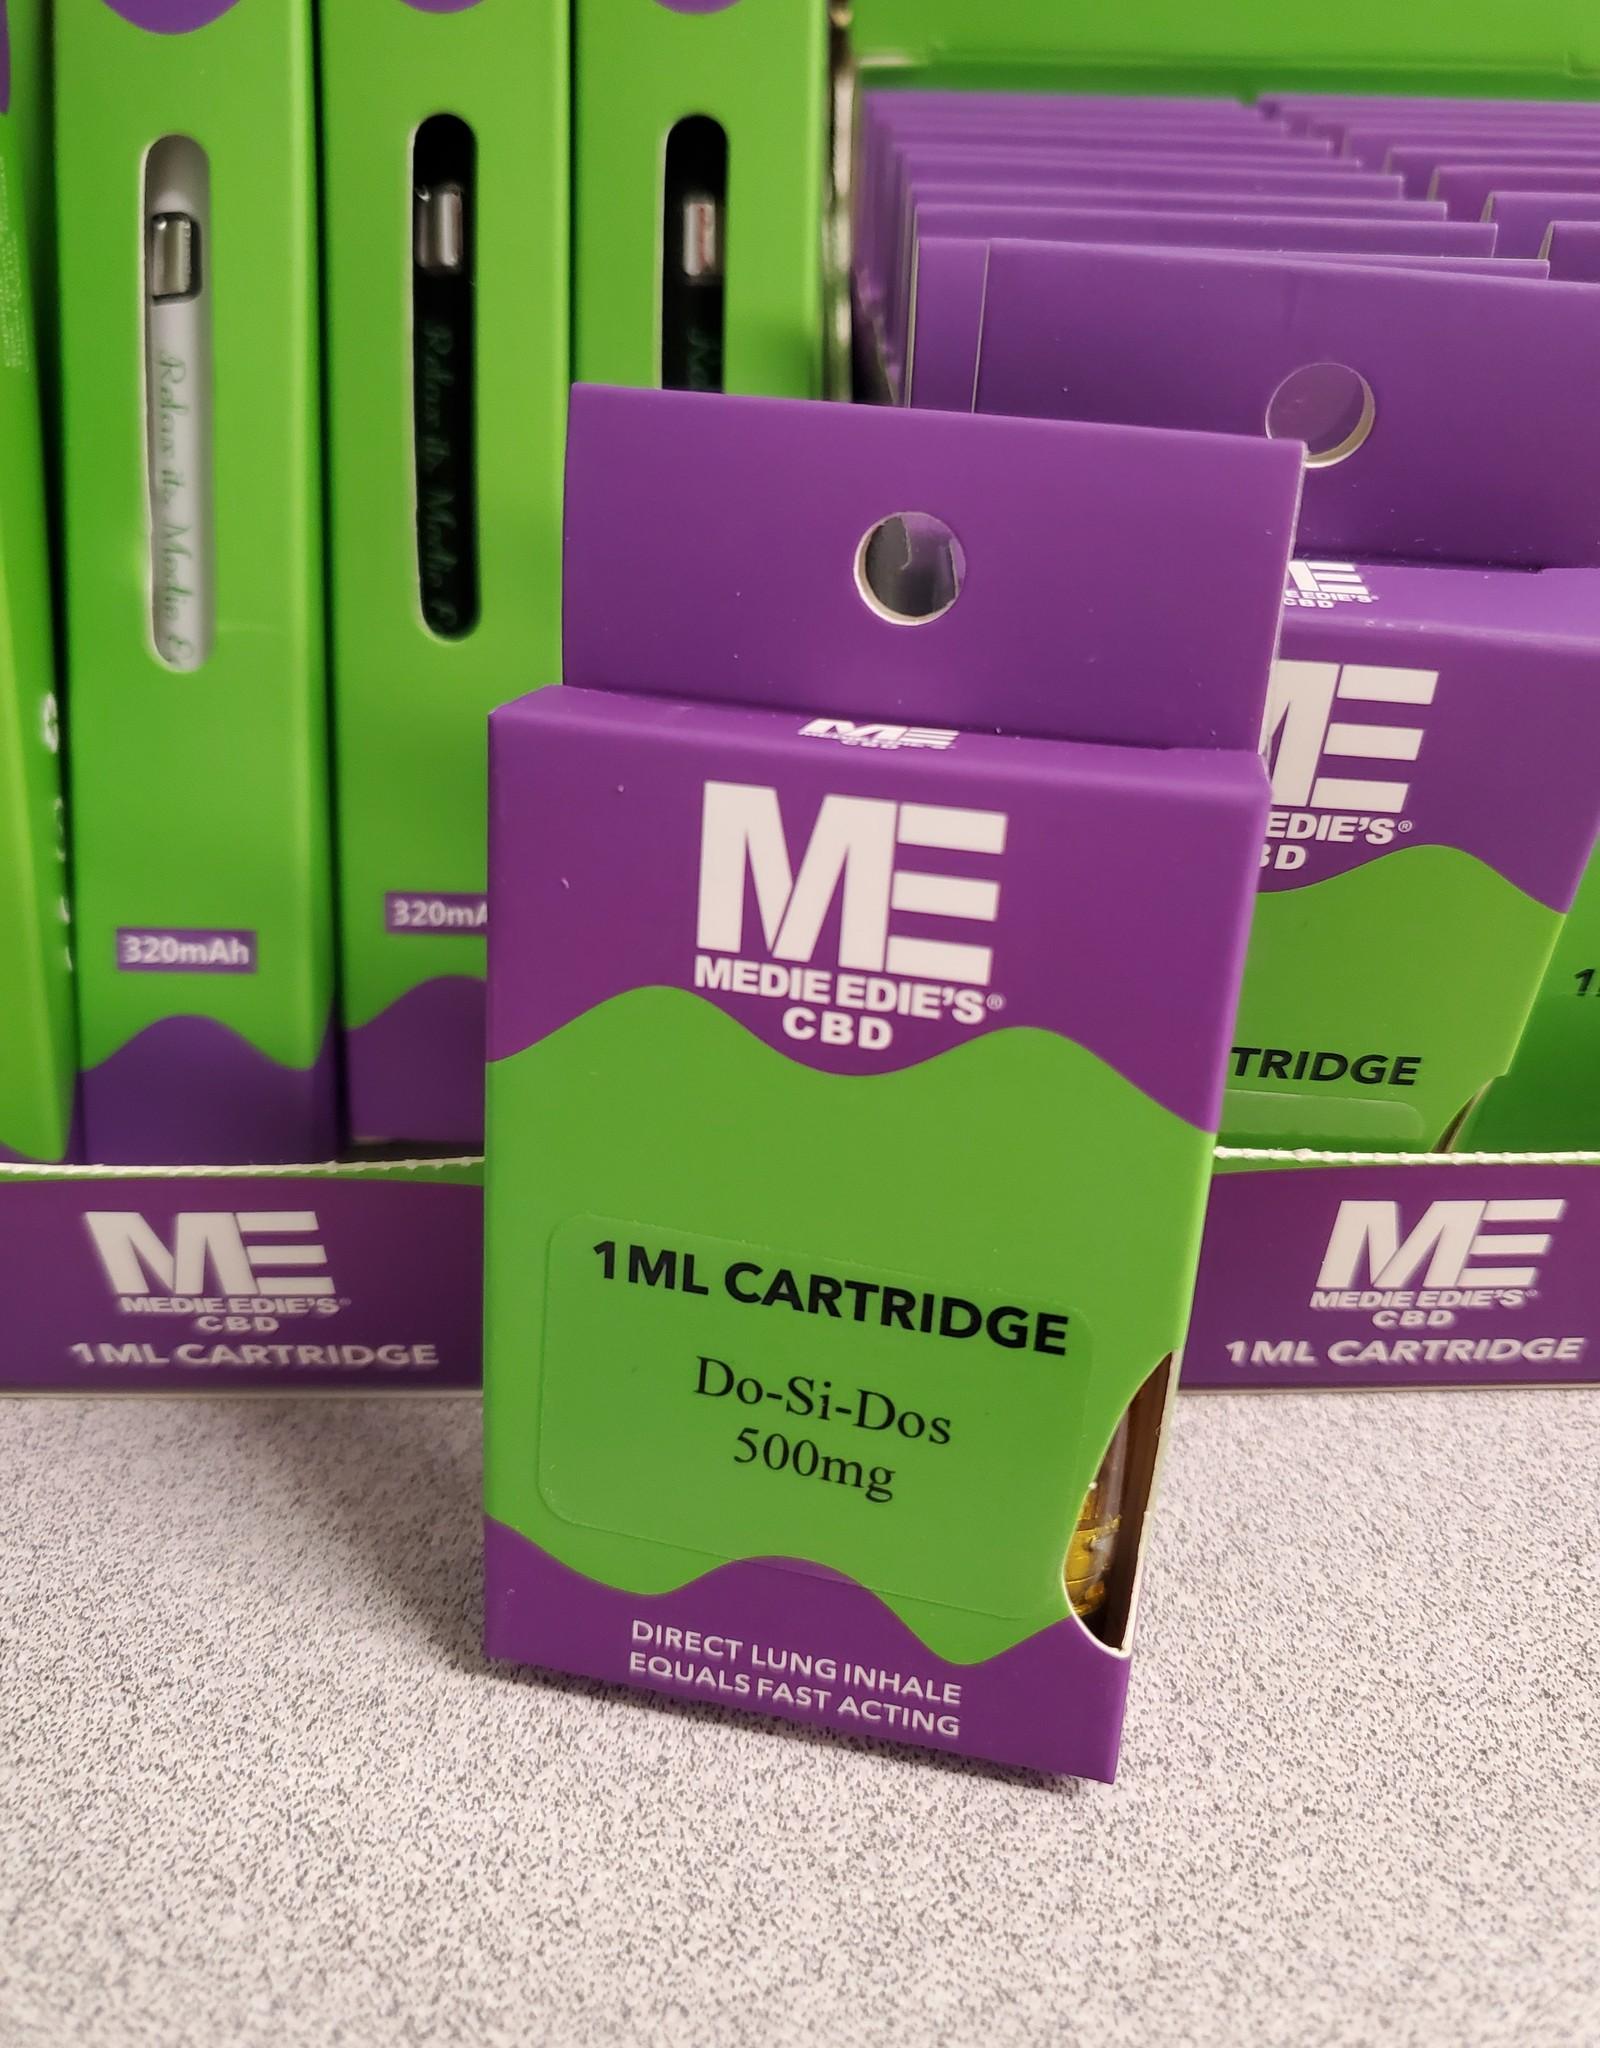 Medie Edie's Do-Si-Dos CBD Vape Cartridge - 500mg - 1ml -